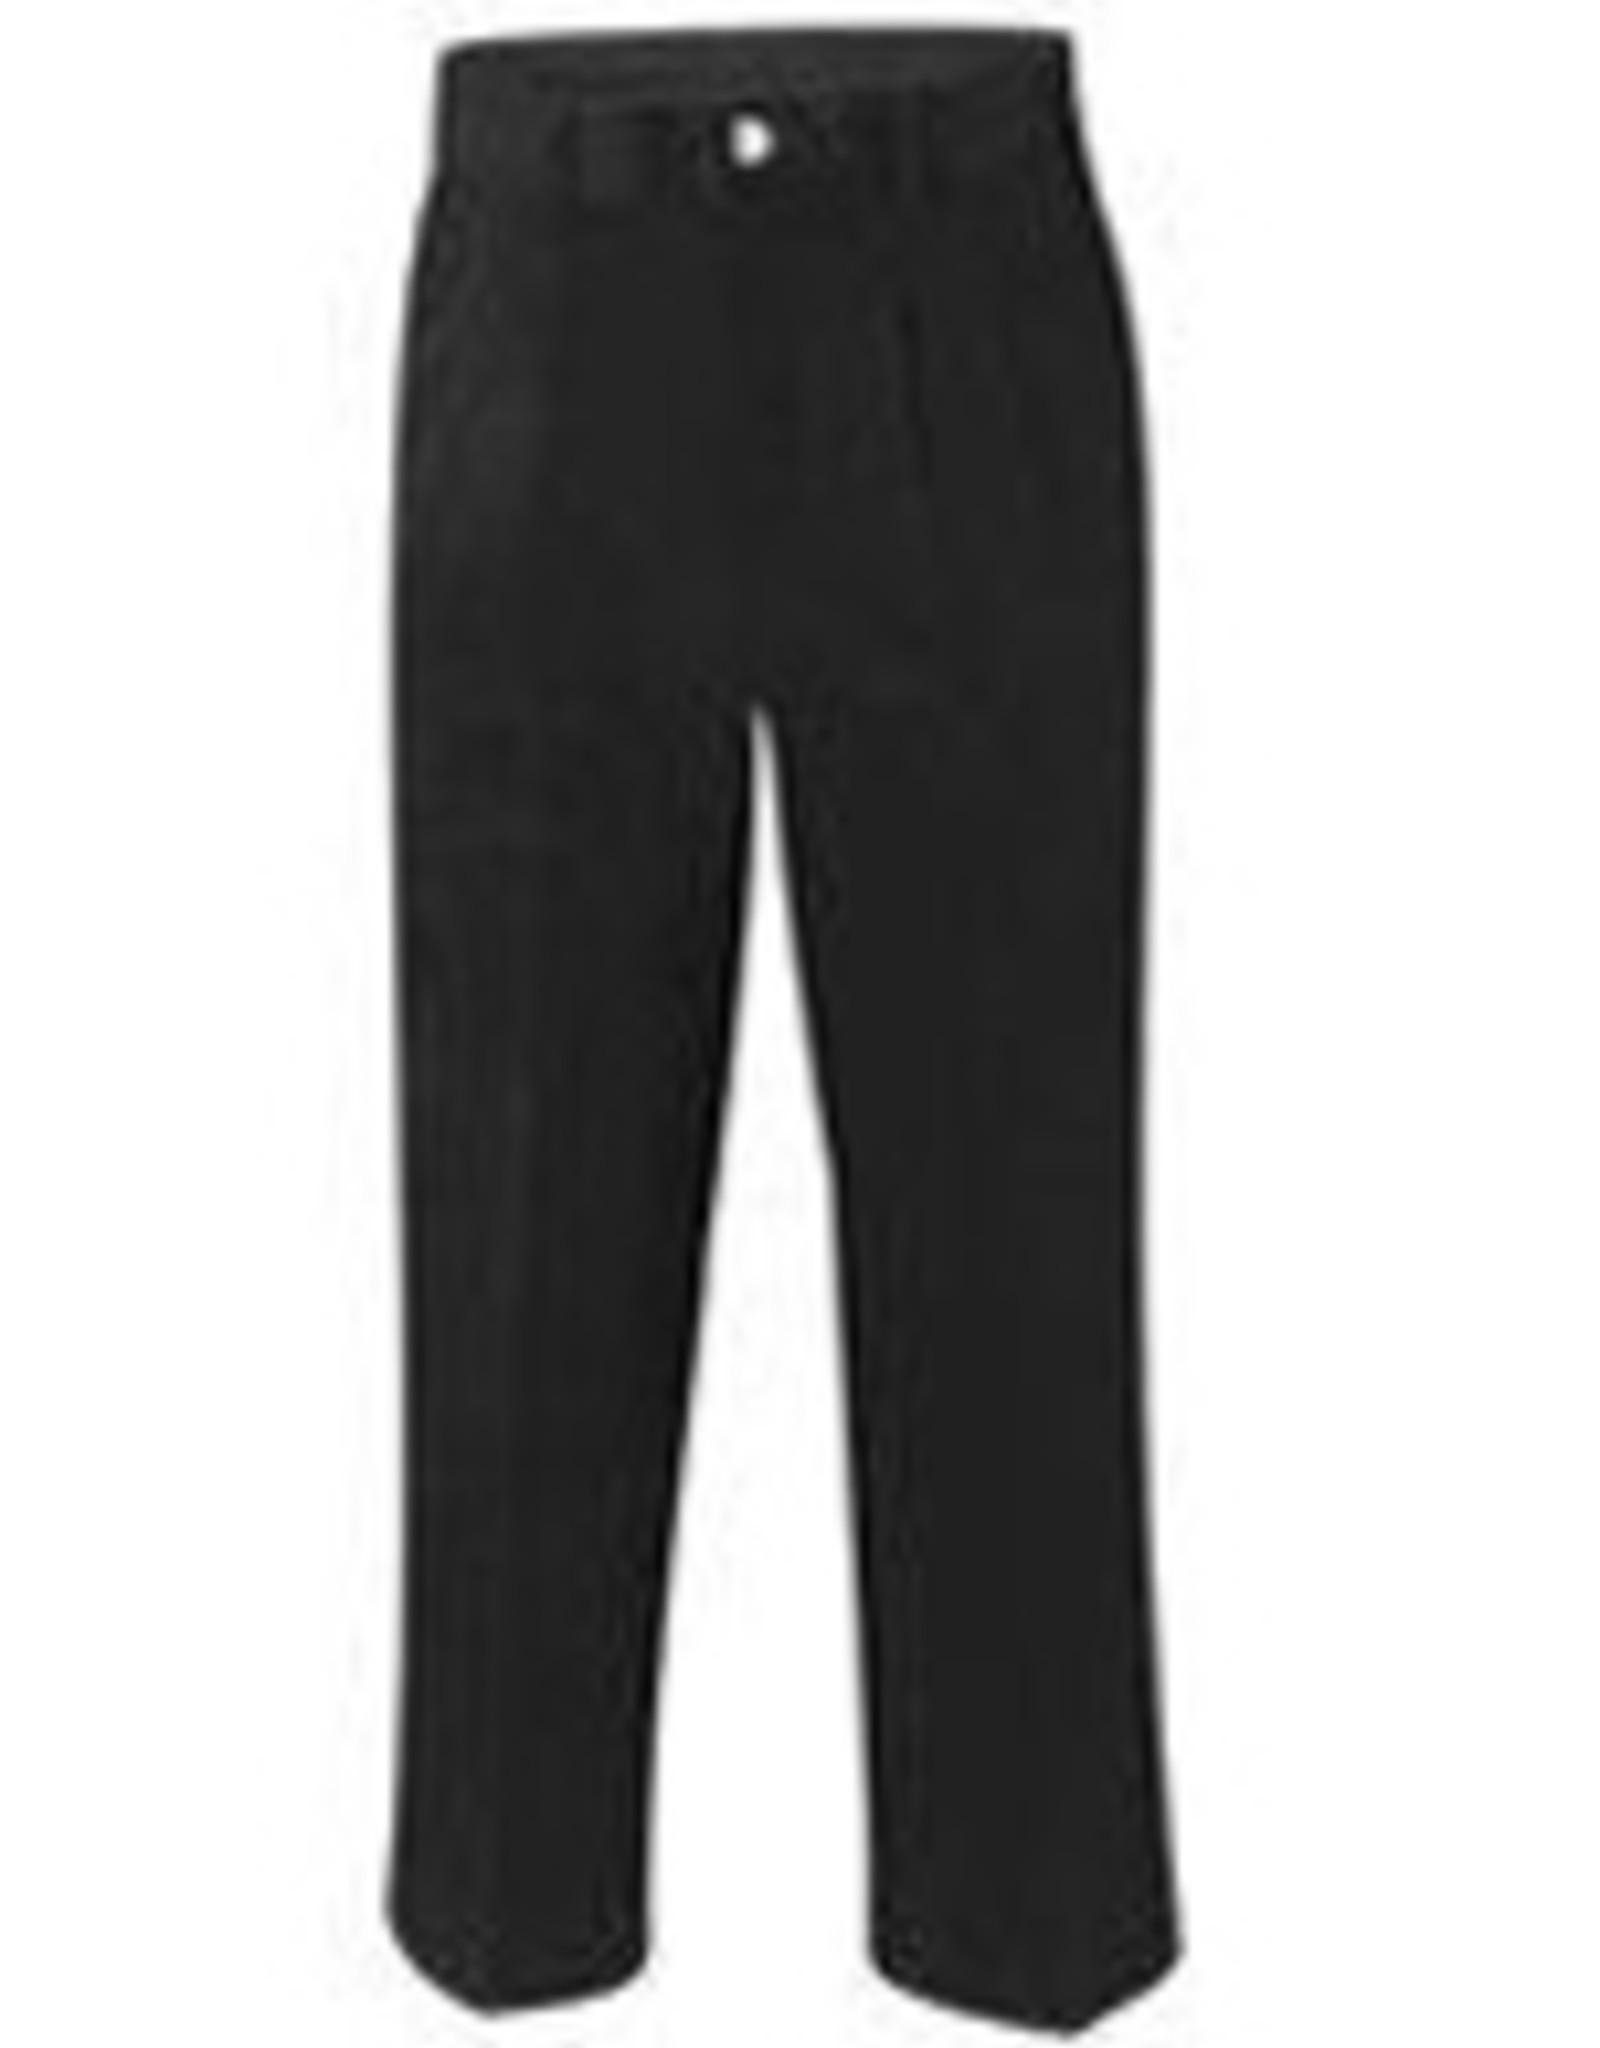 School Apparel Pants - Boys (Navy only)